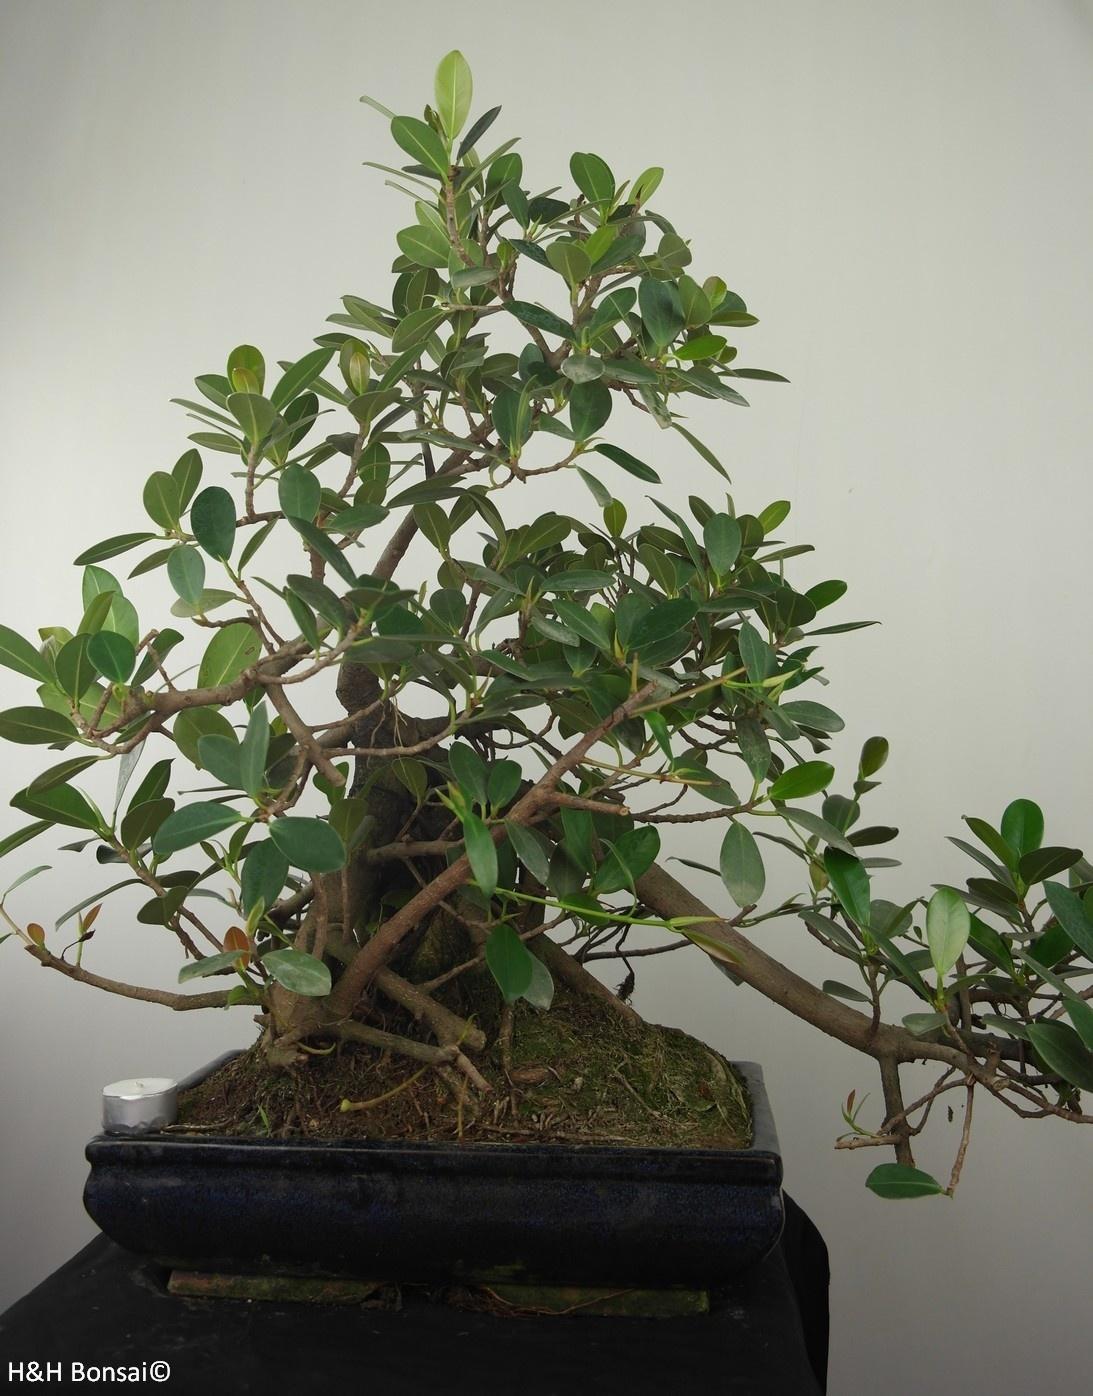 Bonsai Fig Tree, Ficus microcarpa panda, no. 7681